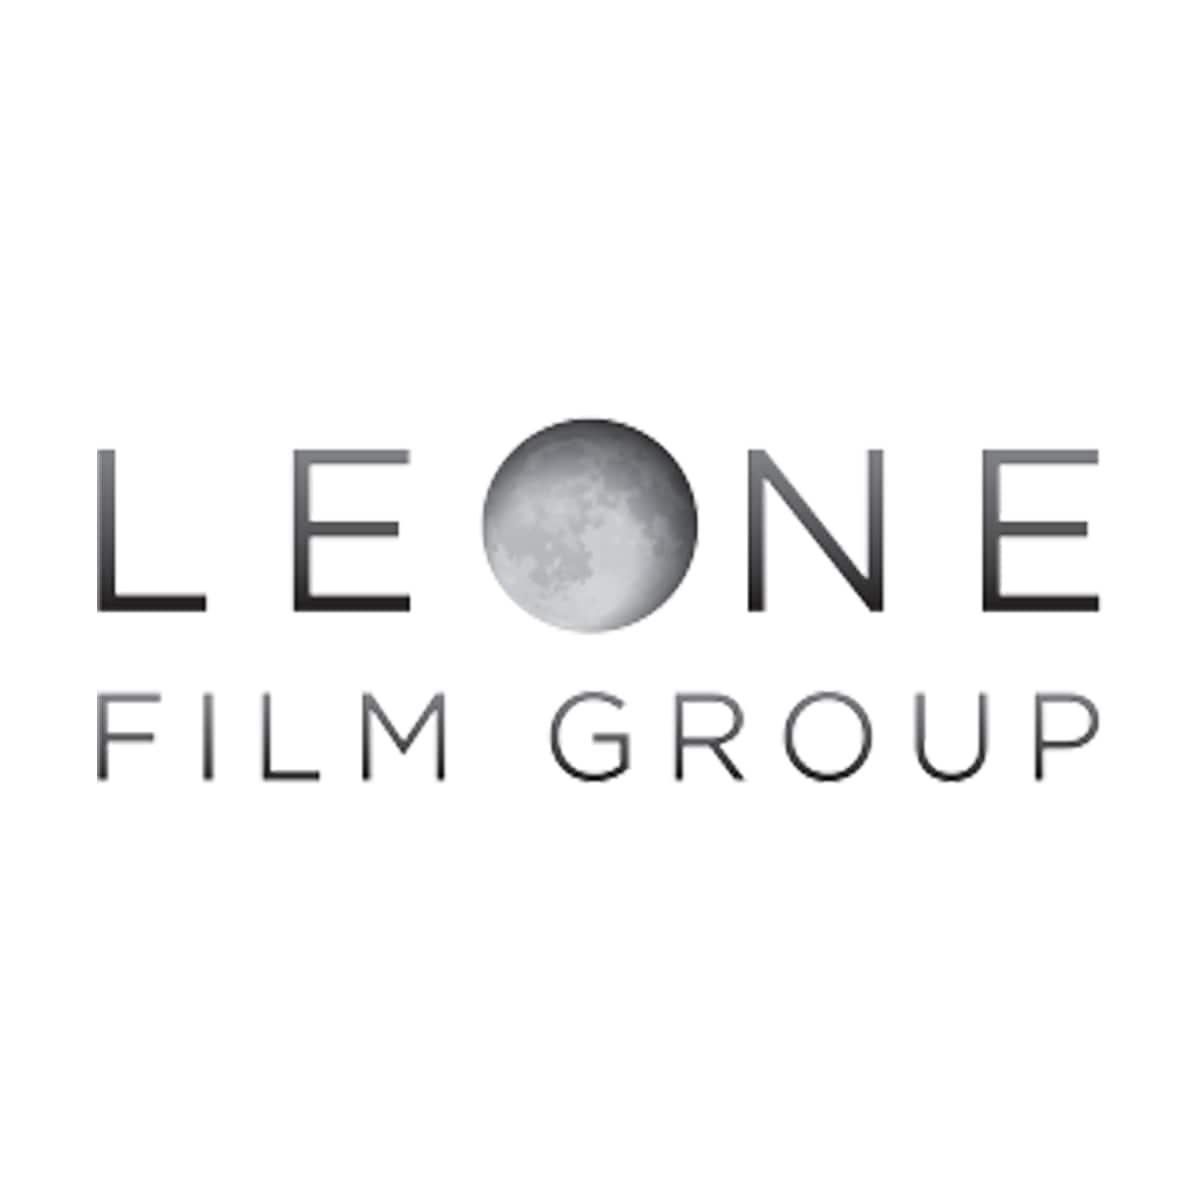 Leone Film Group, CdA delibera emissione bond